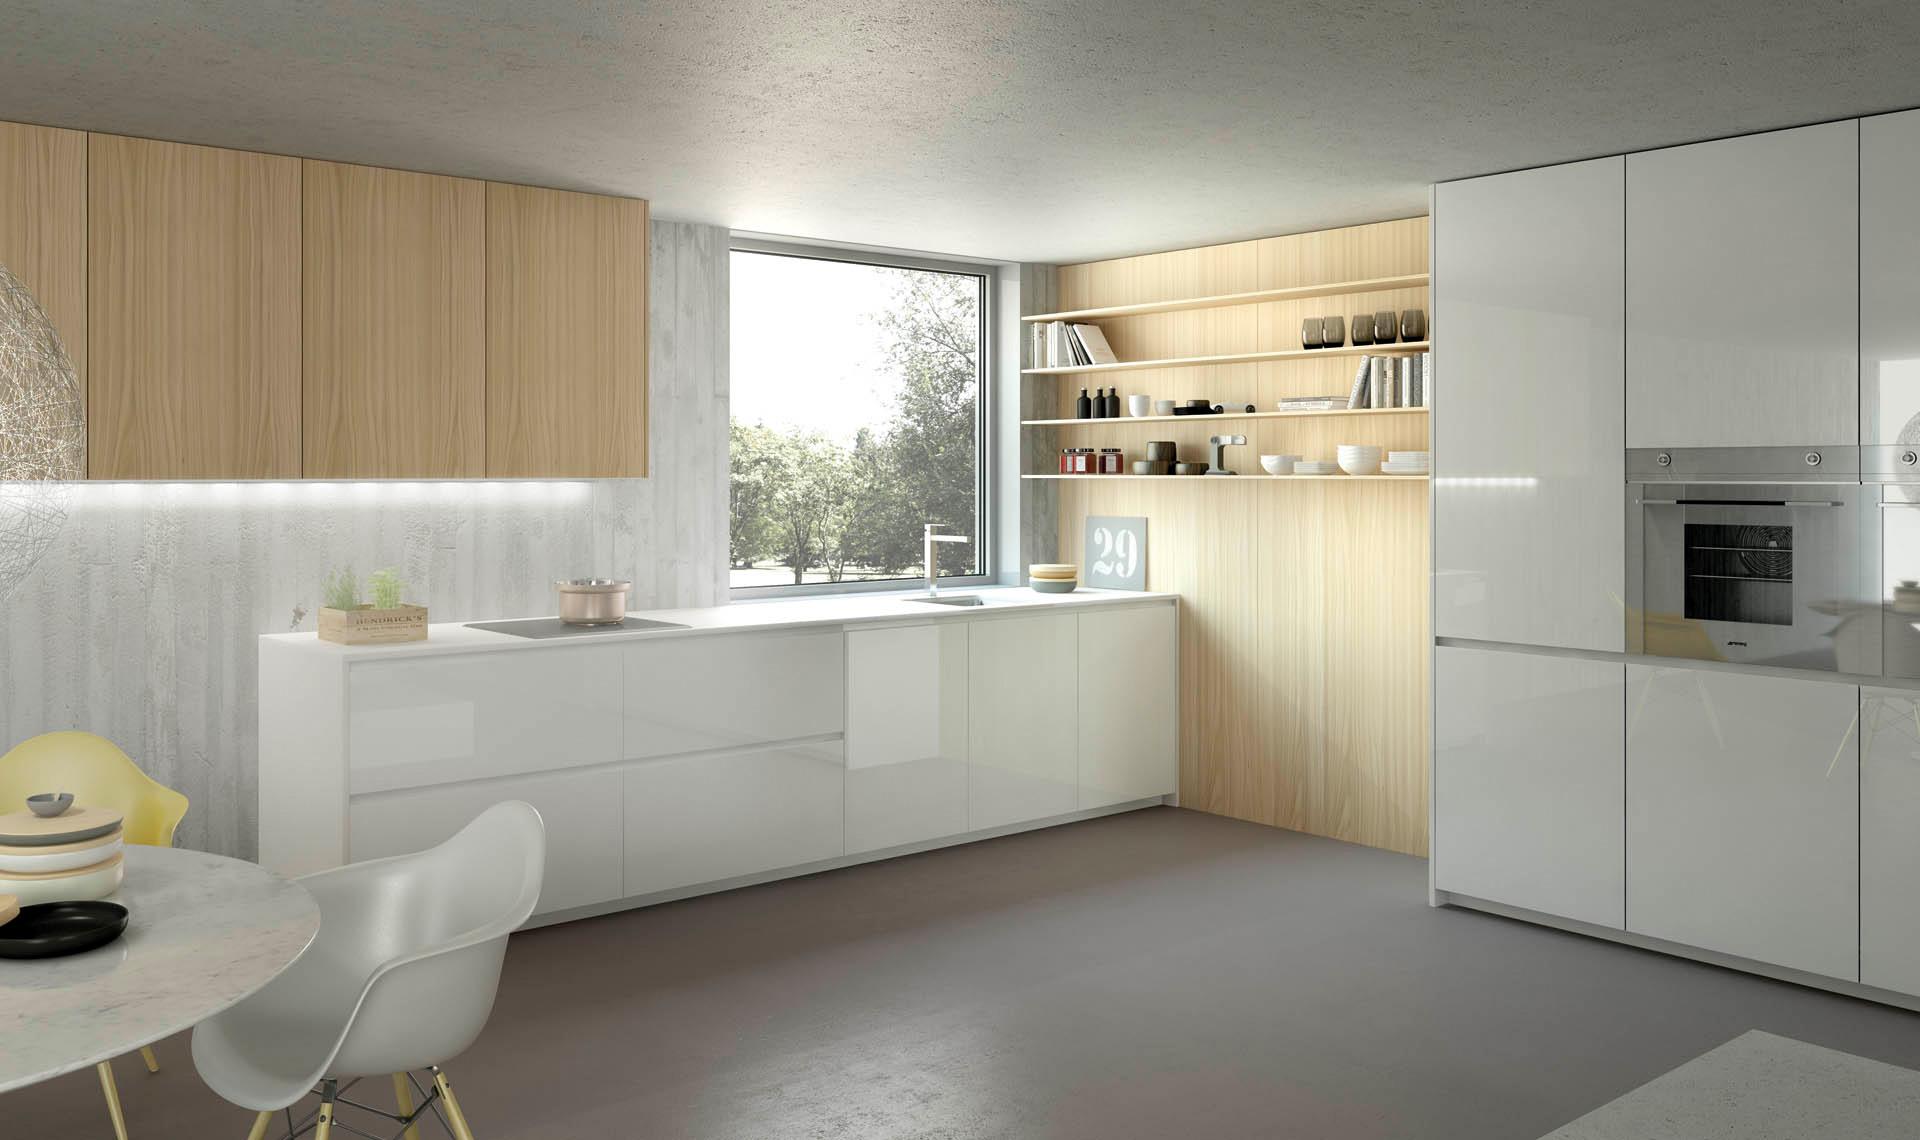 Cucine Open Space Moderne valdesign realizza cucine moderne. cucine moderne di alta